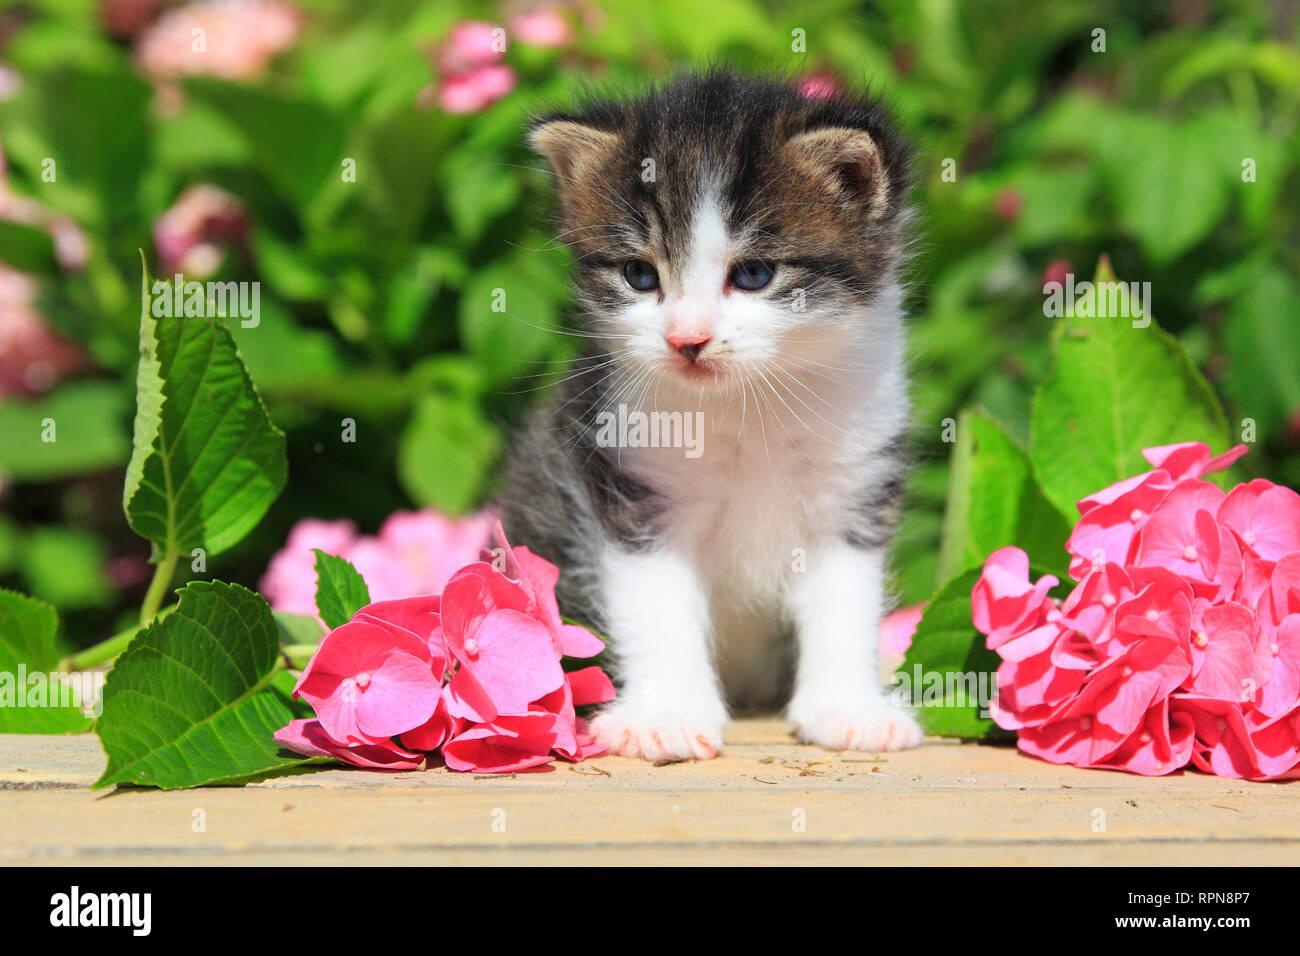 Zoología / animales, mamíferos (Mammalia), gatito, animales domésticos, Suiza, Additional-Rights-Clearance-Info-Not-Available Foto de stock